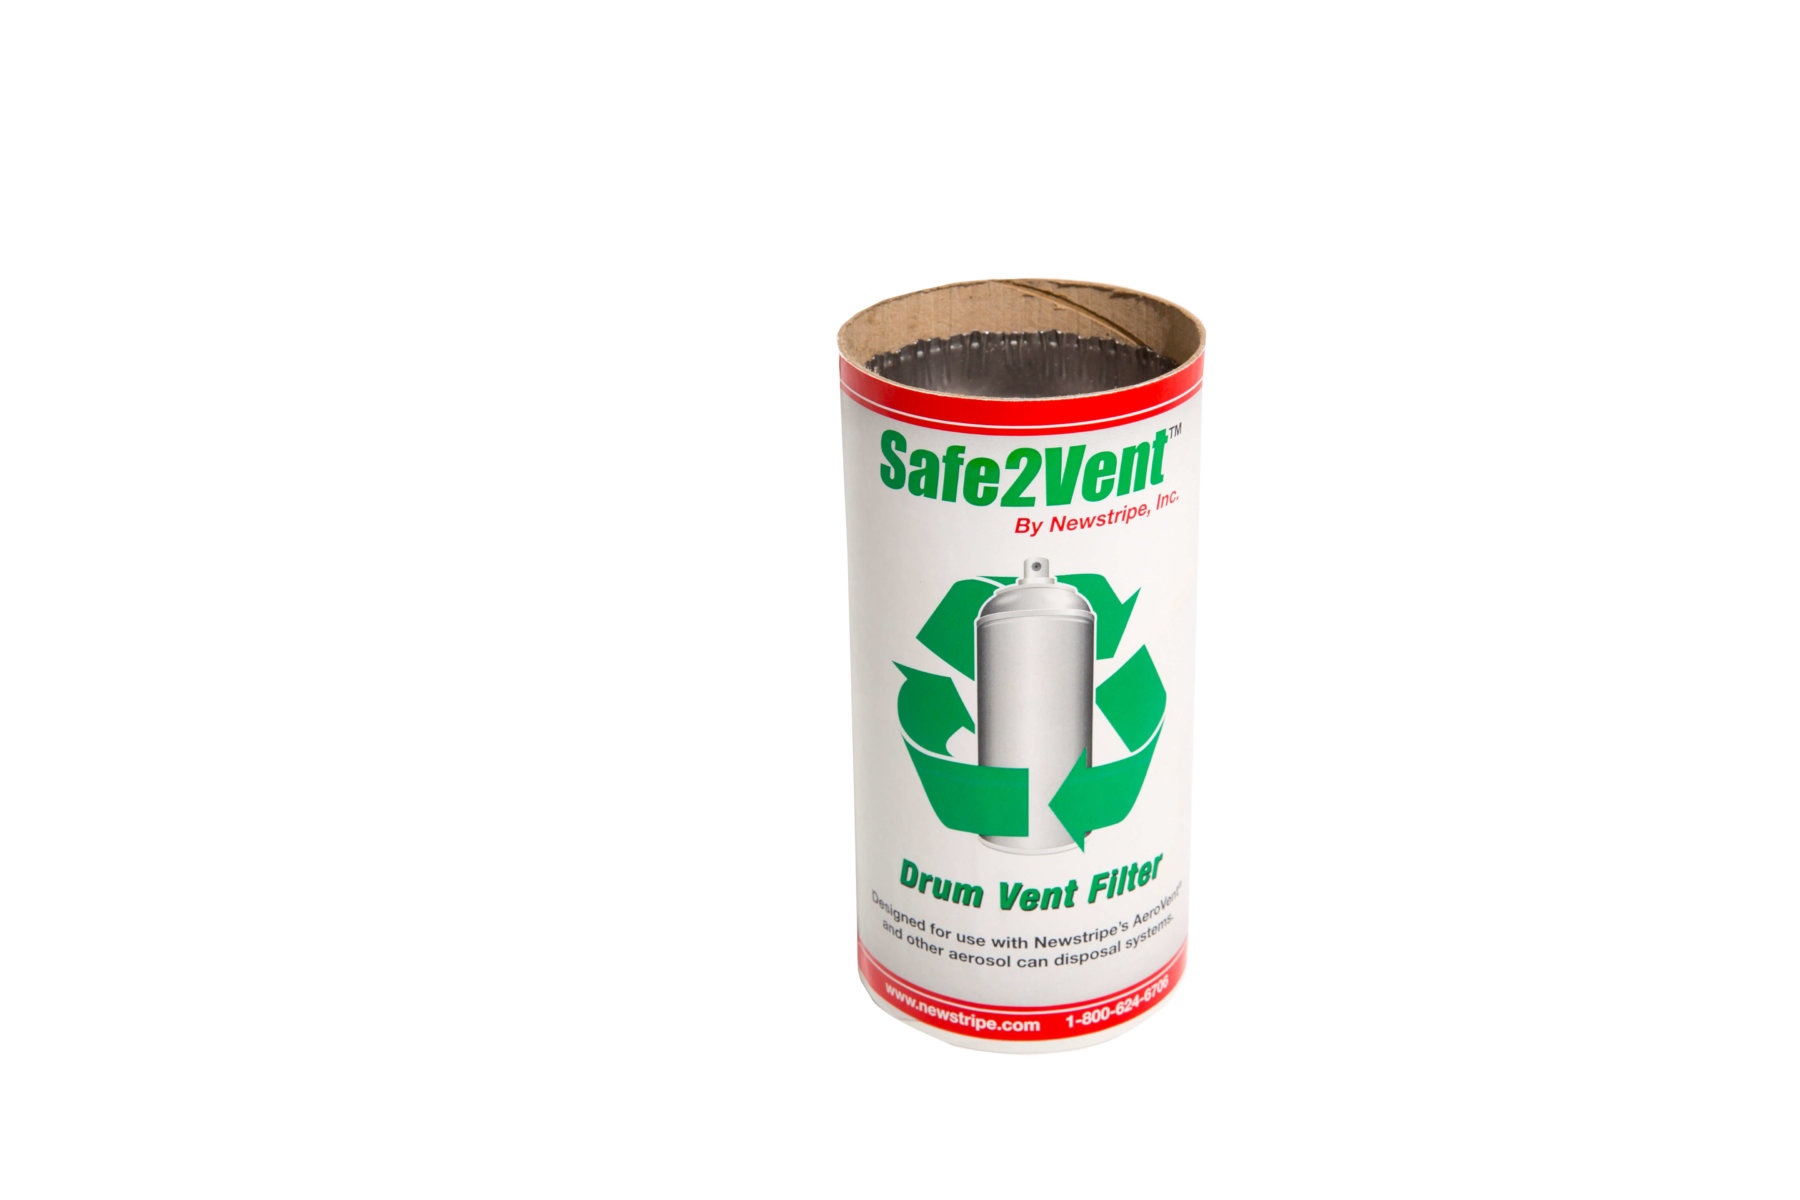 Safe2Vent aerosol can disposal cartridge